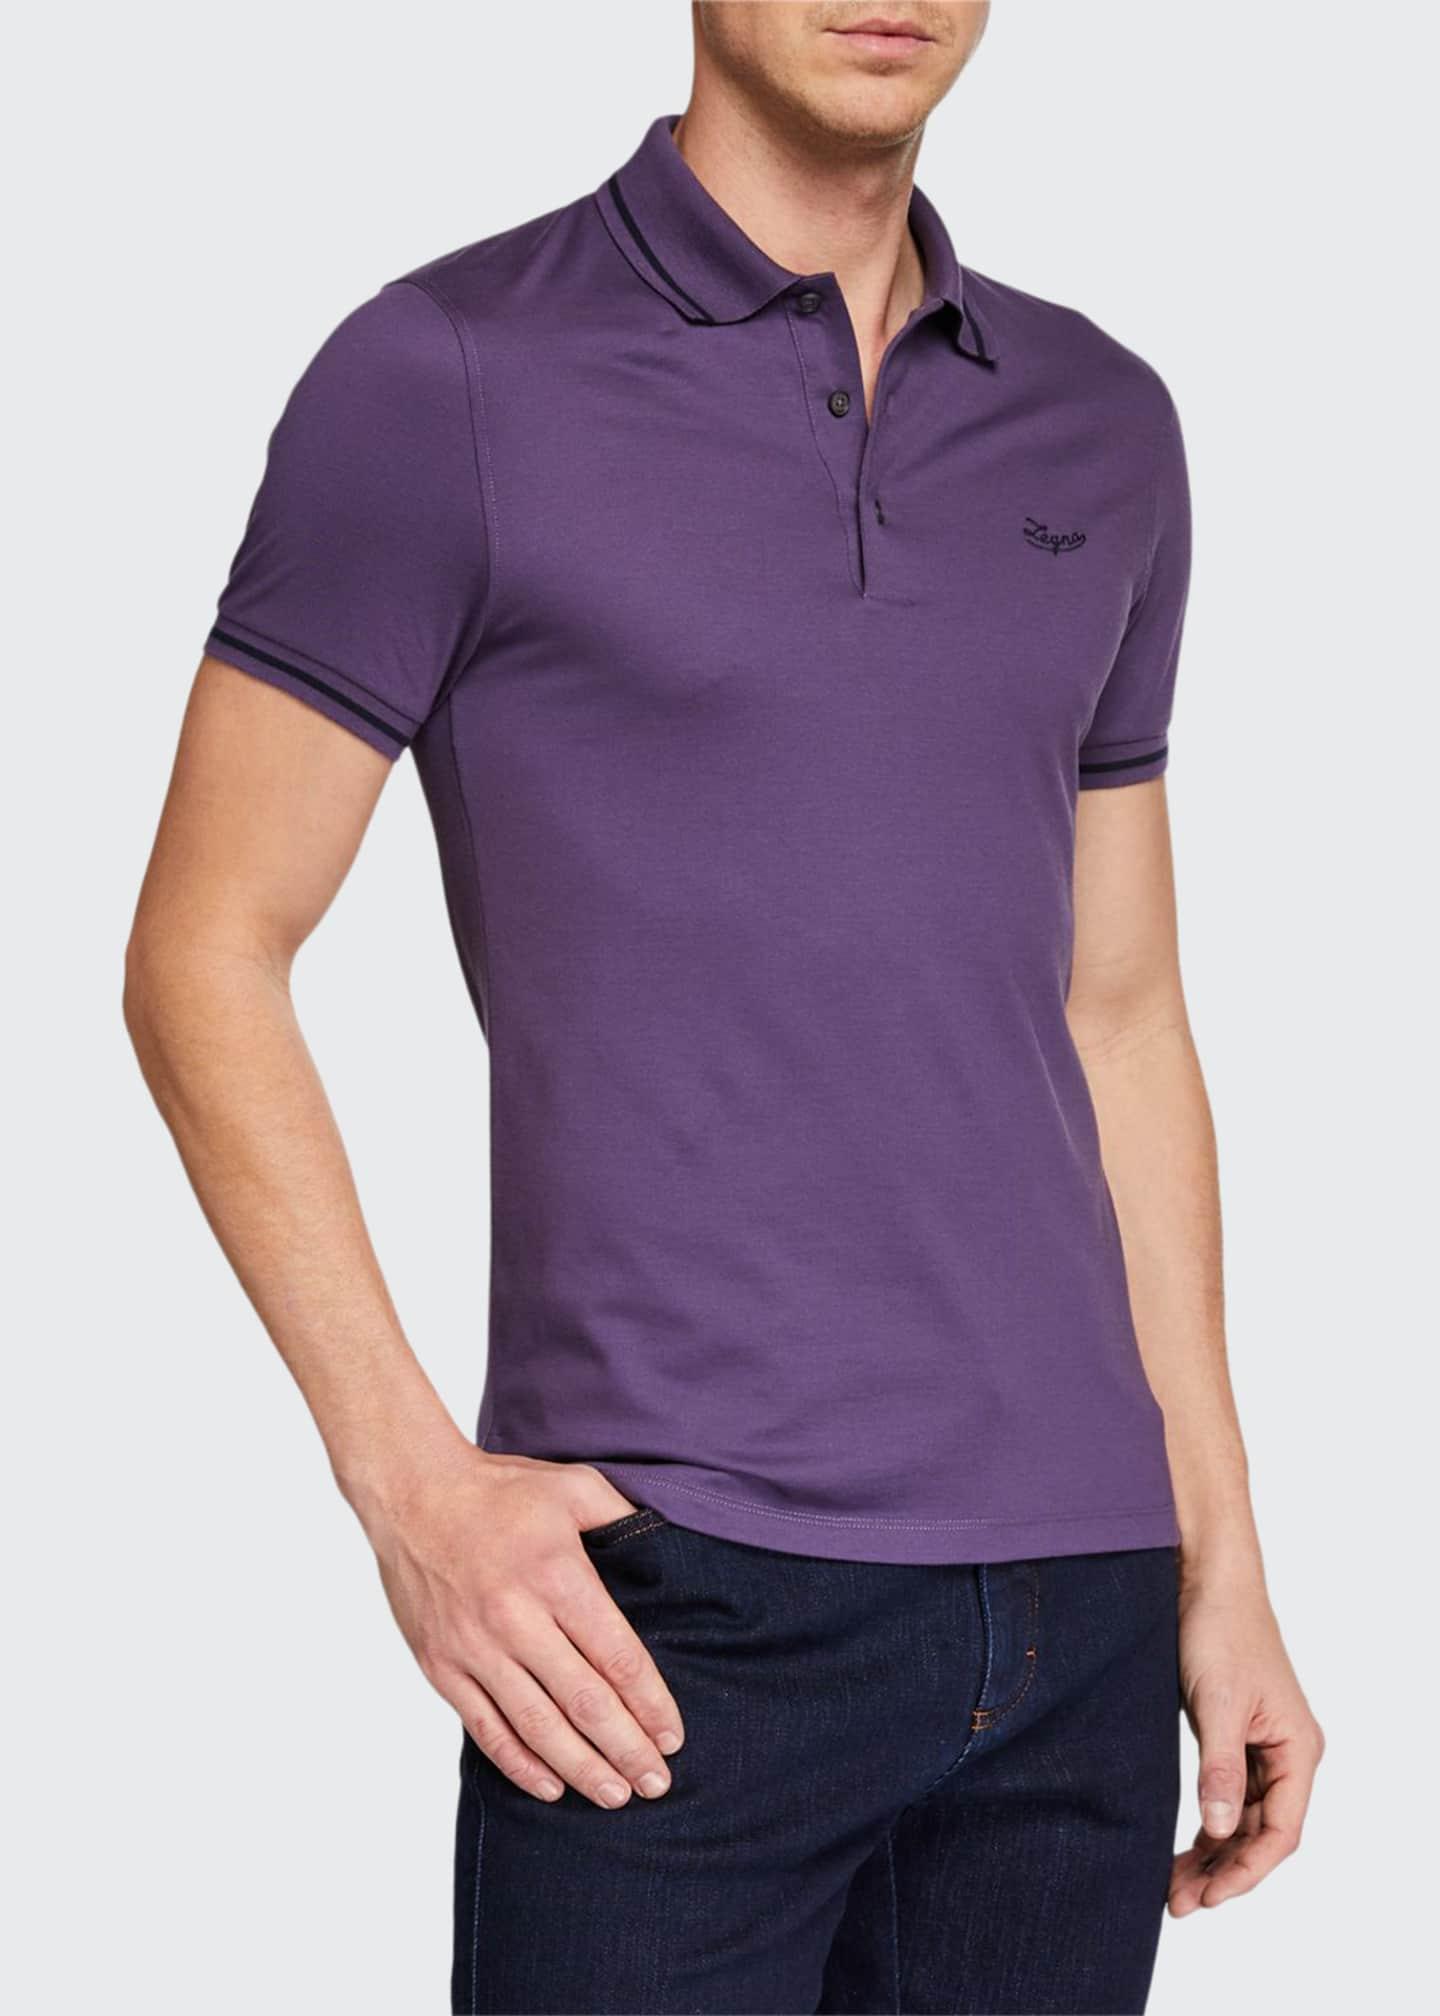 Ermenegildo Zegna Men's Tipped Cotton Jersey Polo Shirt